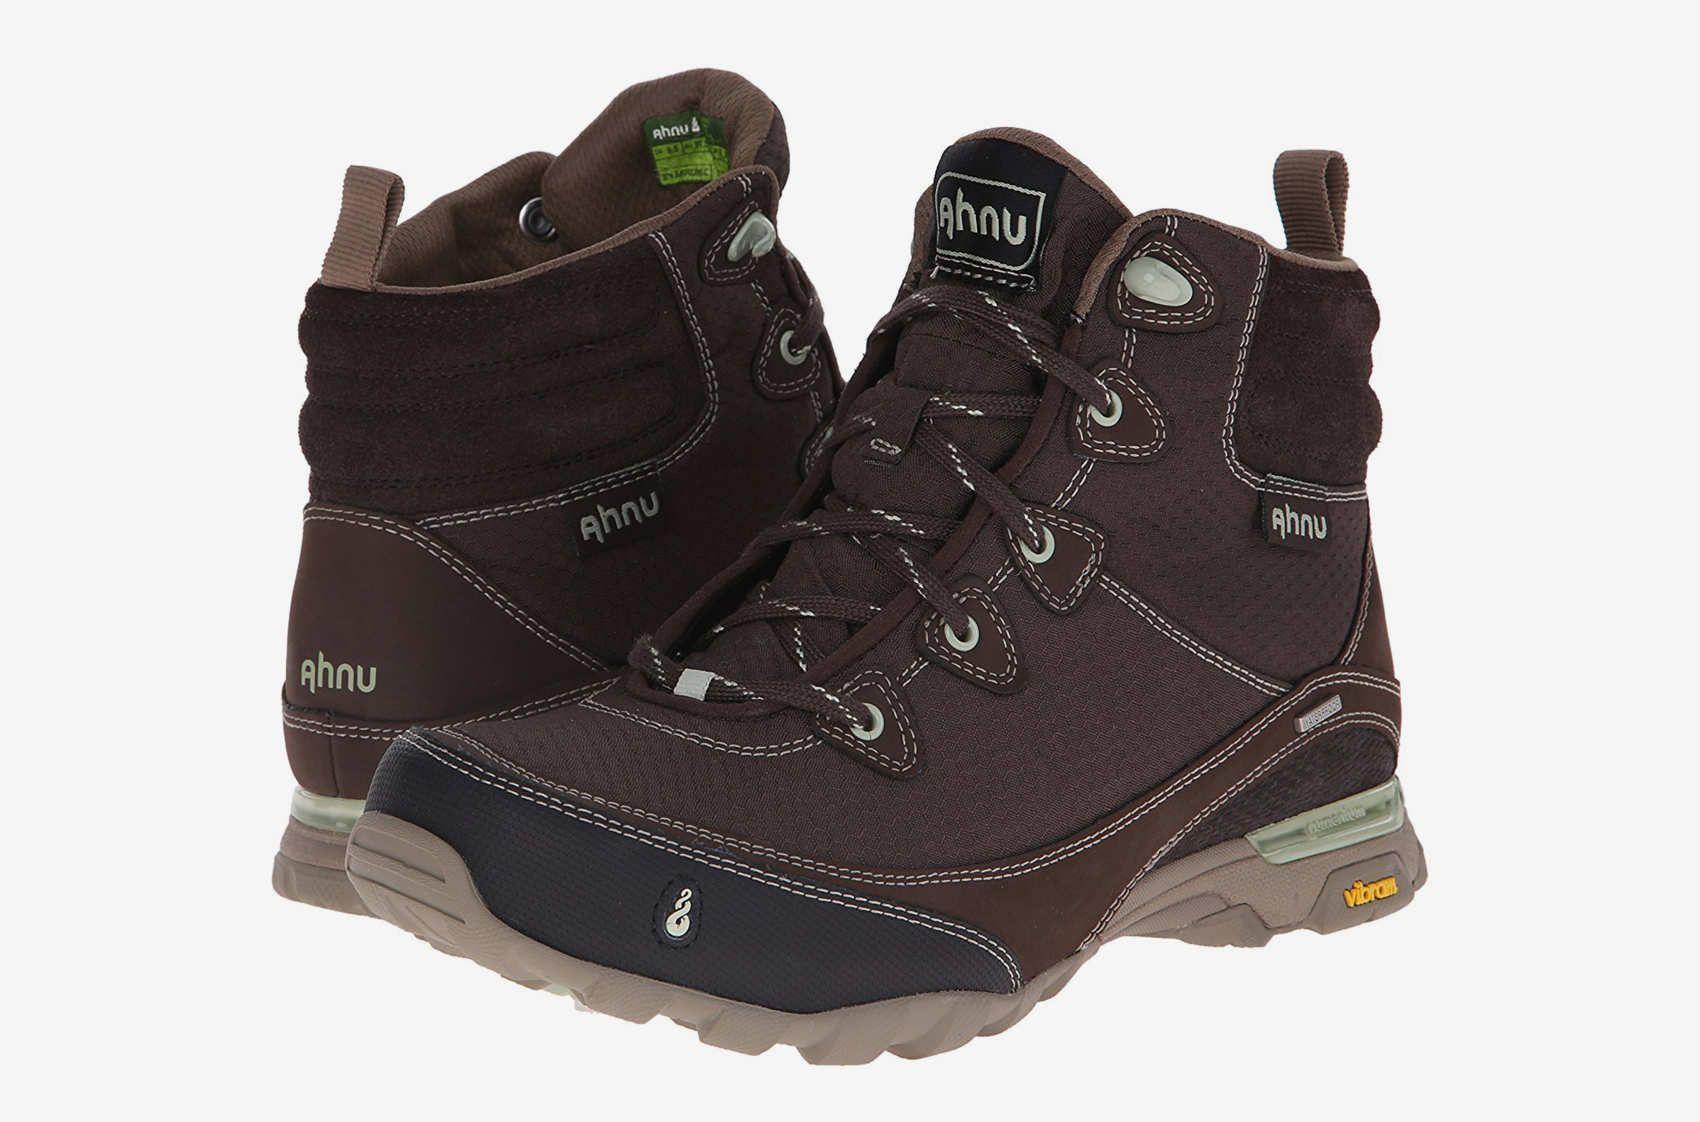 6840f306c ahnu best lightweight women s hiking boots